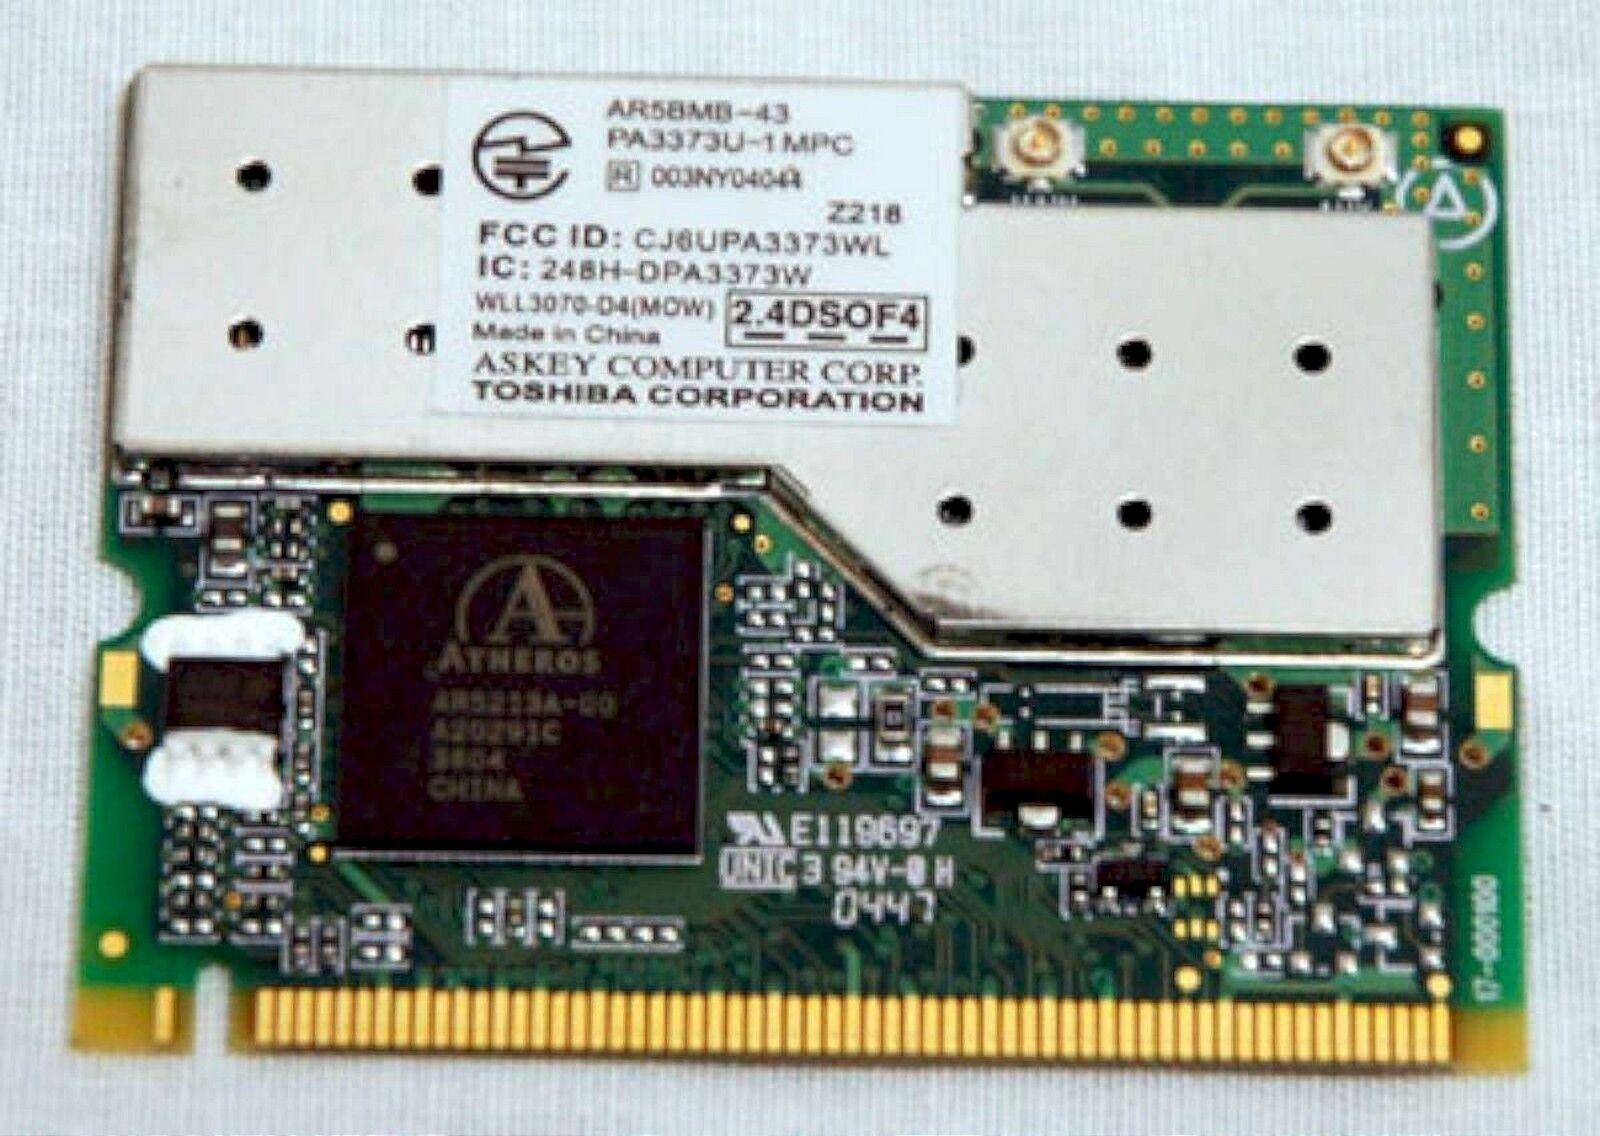 Toshiba Satellite A75 M35X Laptop WiFi WIRELESS CARD PA3373U-1MPC AR5BMB-43 A70